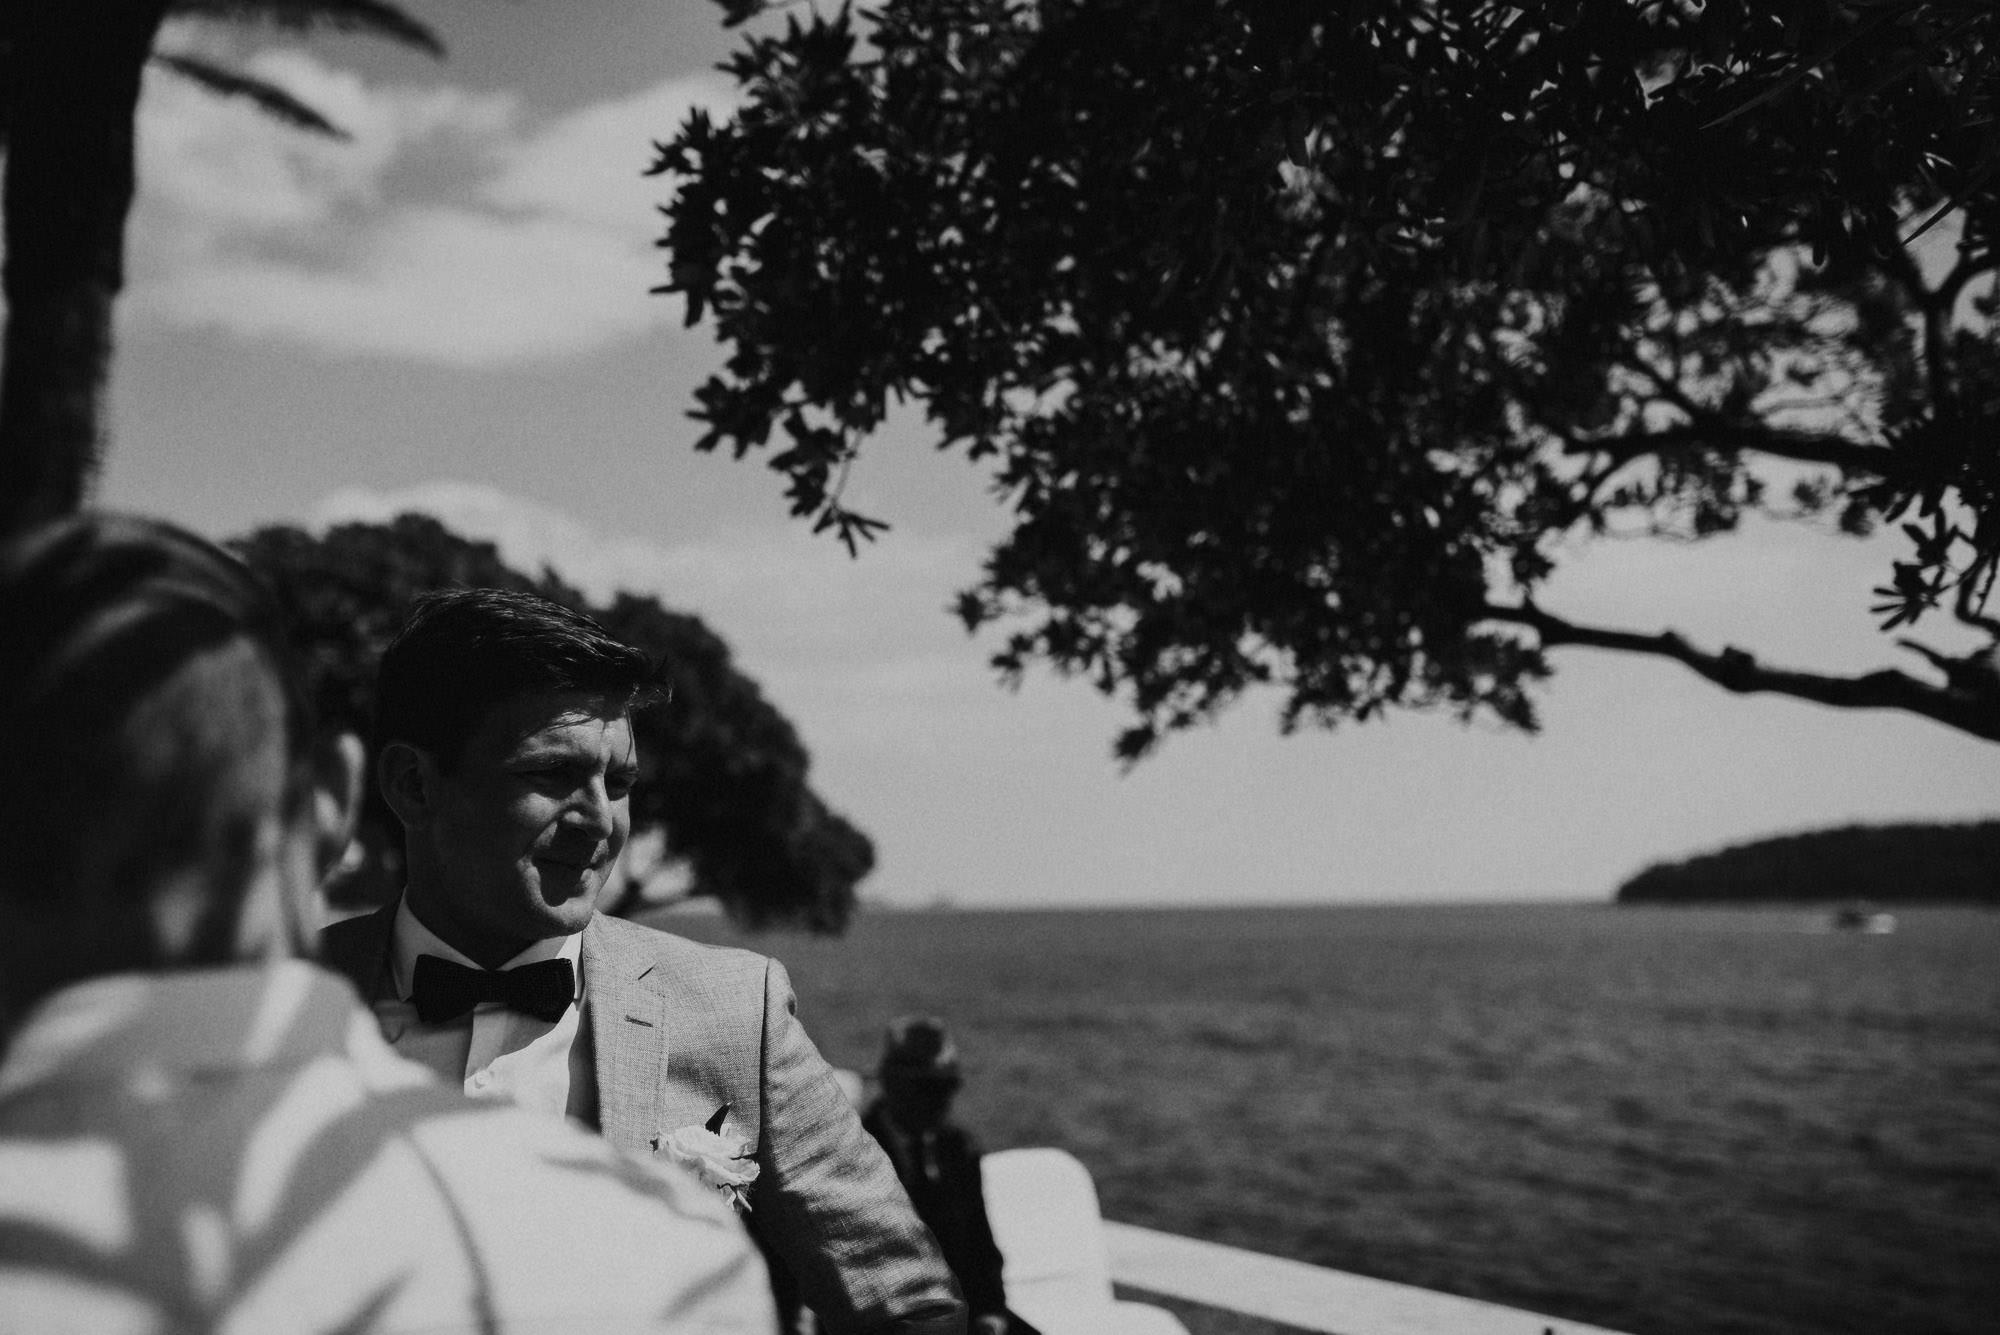 dubrovnik_croatia_wedding_photographer-jere_satamo-destination_weddings-039-web.jpg